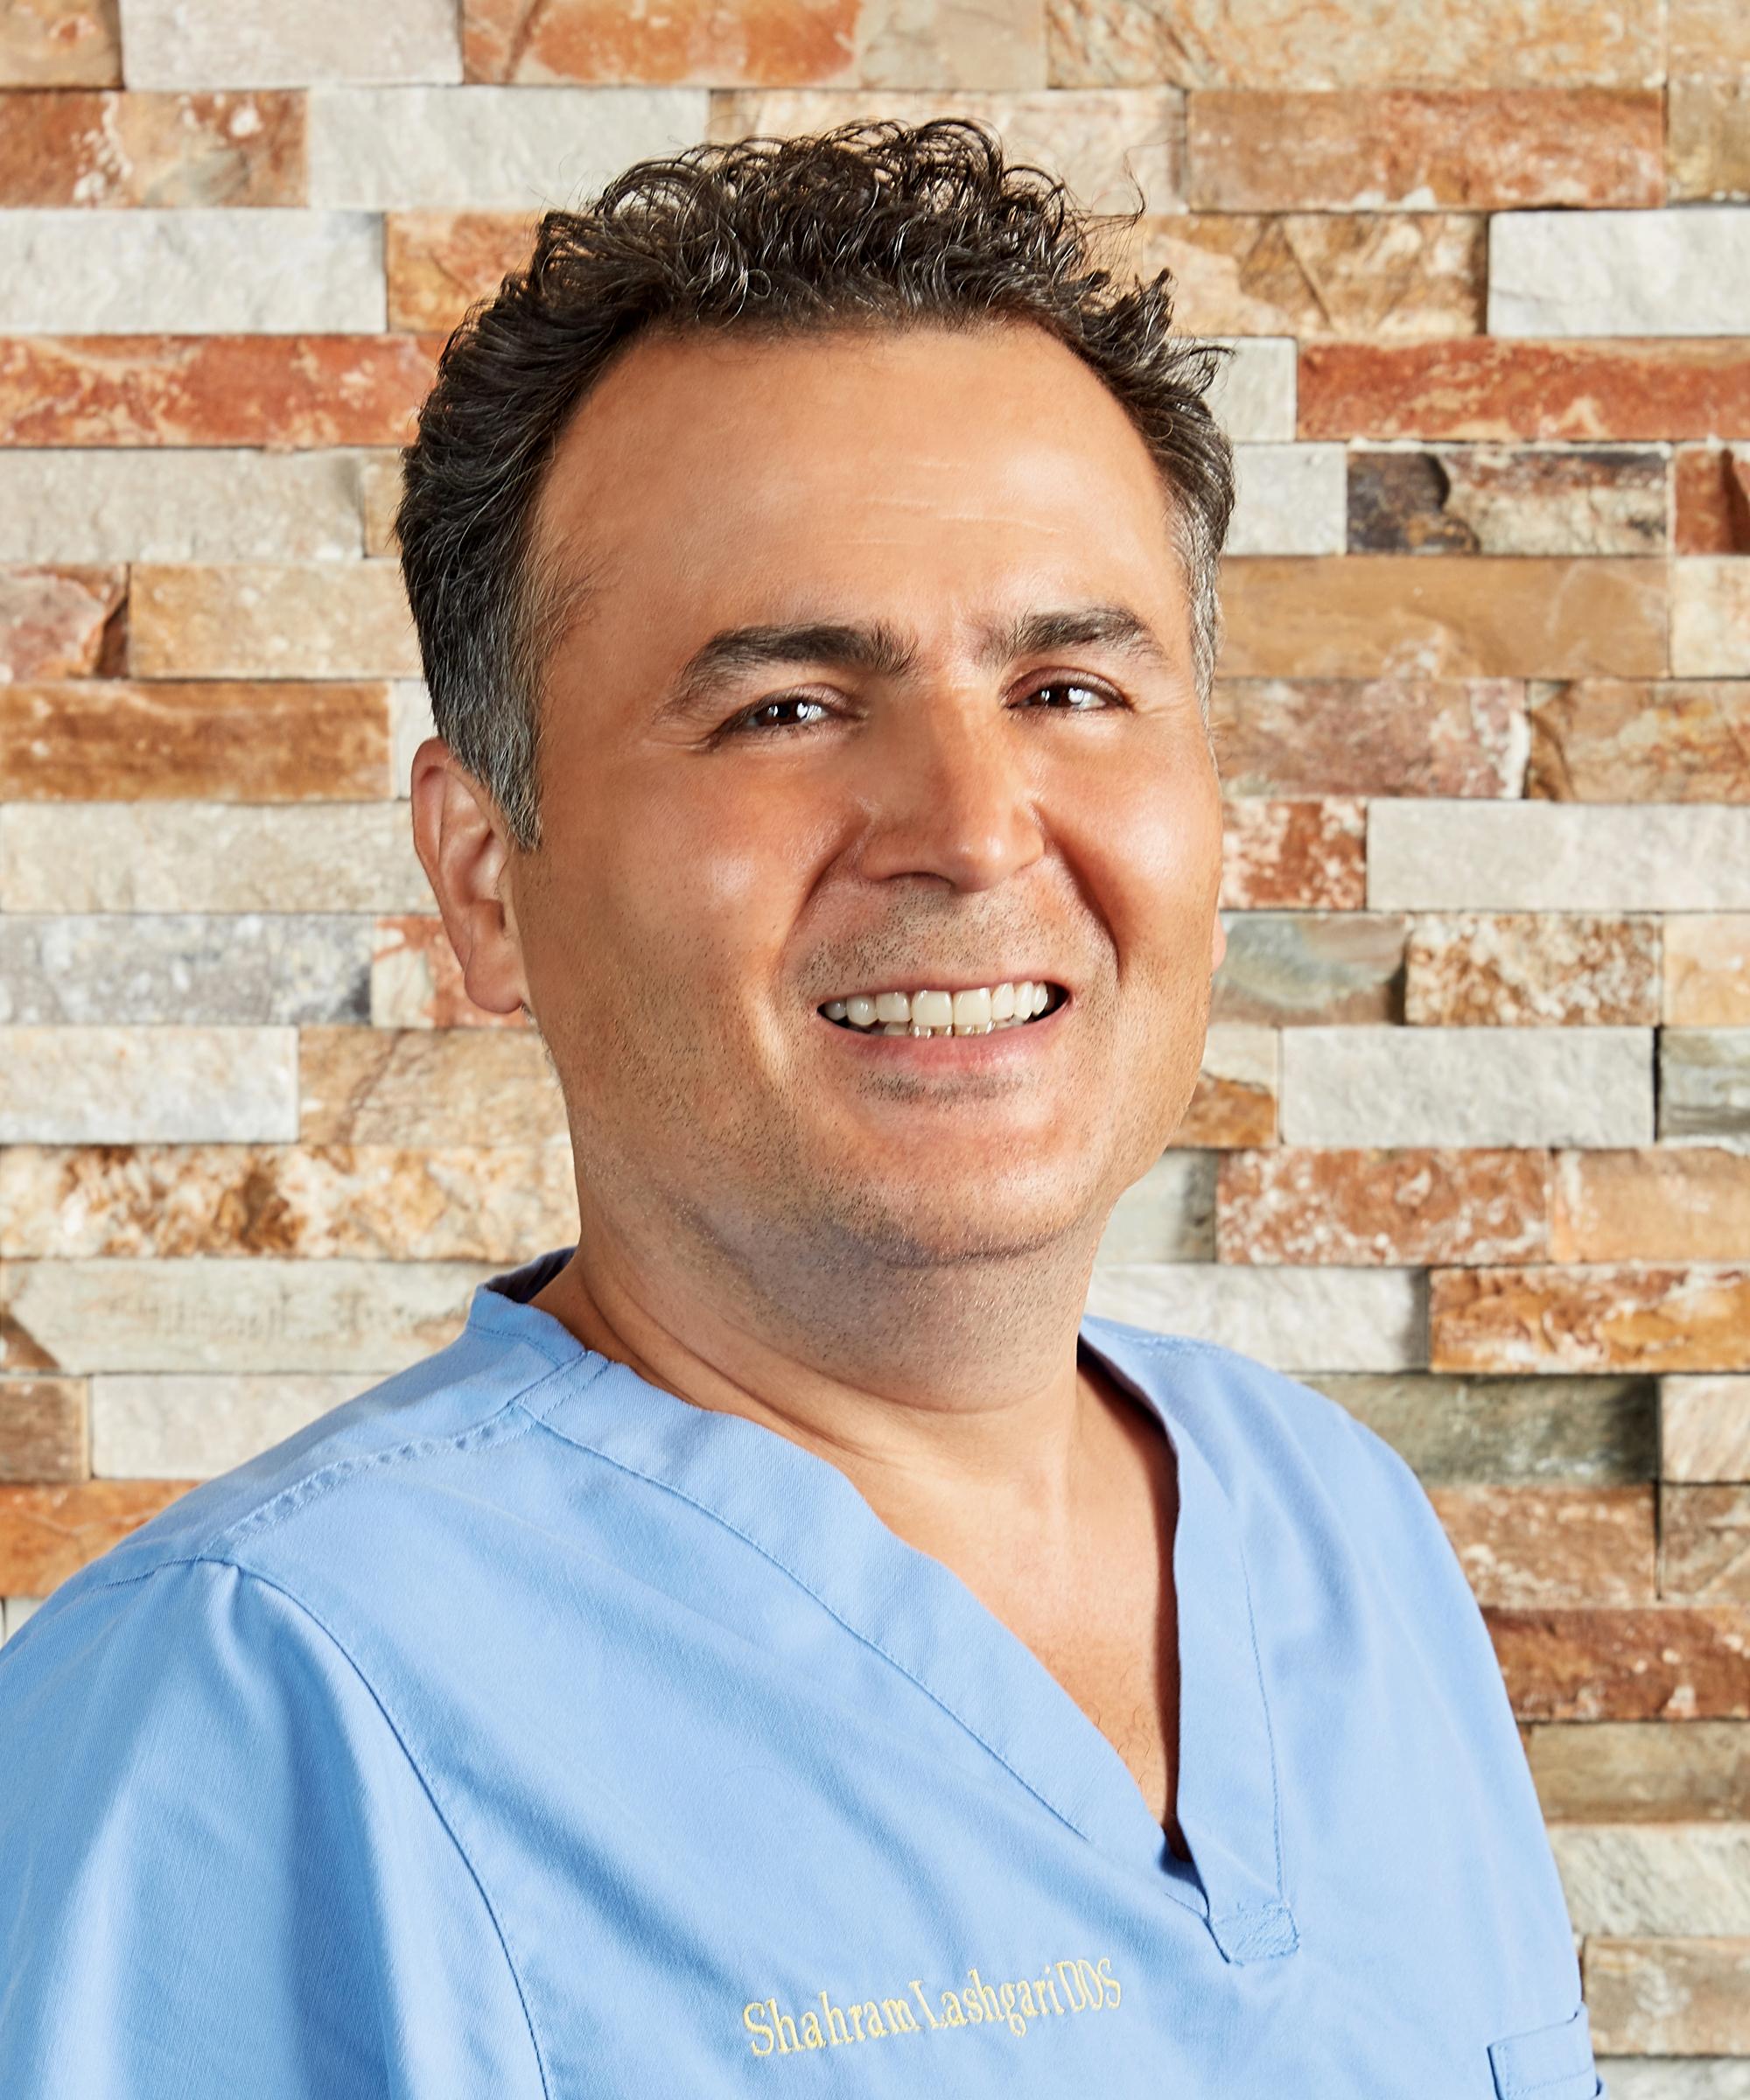 Dr. Shahram Lashgari |Credit: Photography by Eric Garcia-March